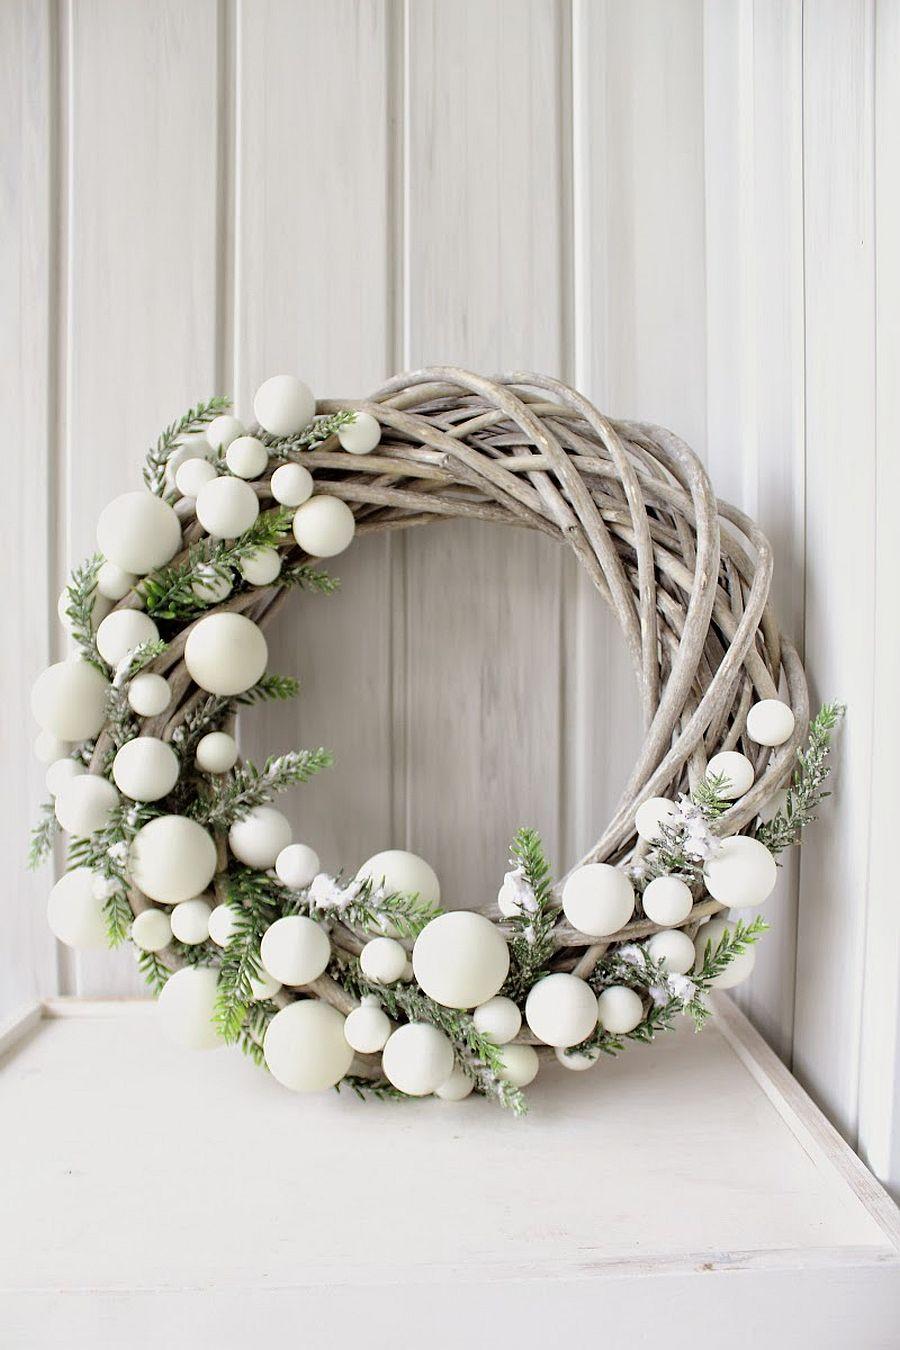 Festive Diy Holiday Season Wreaths As You Gear Up For